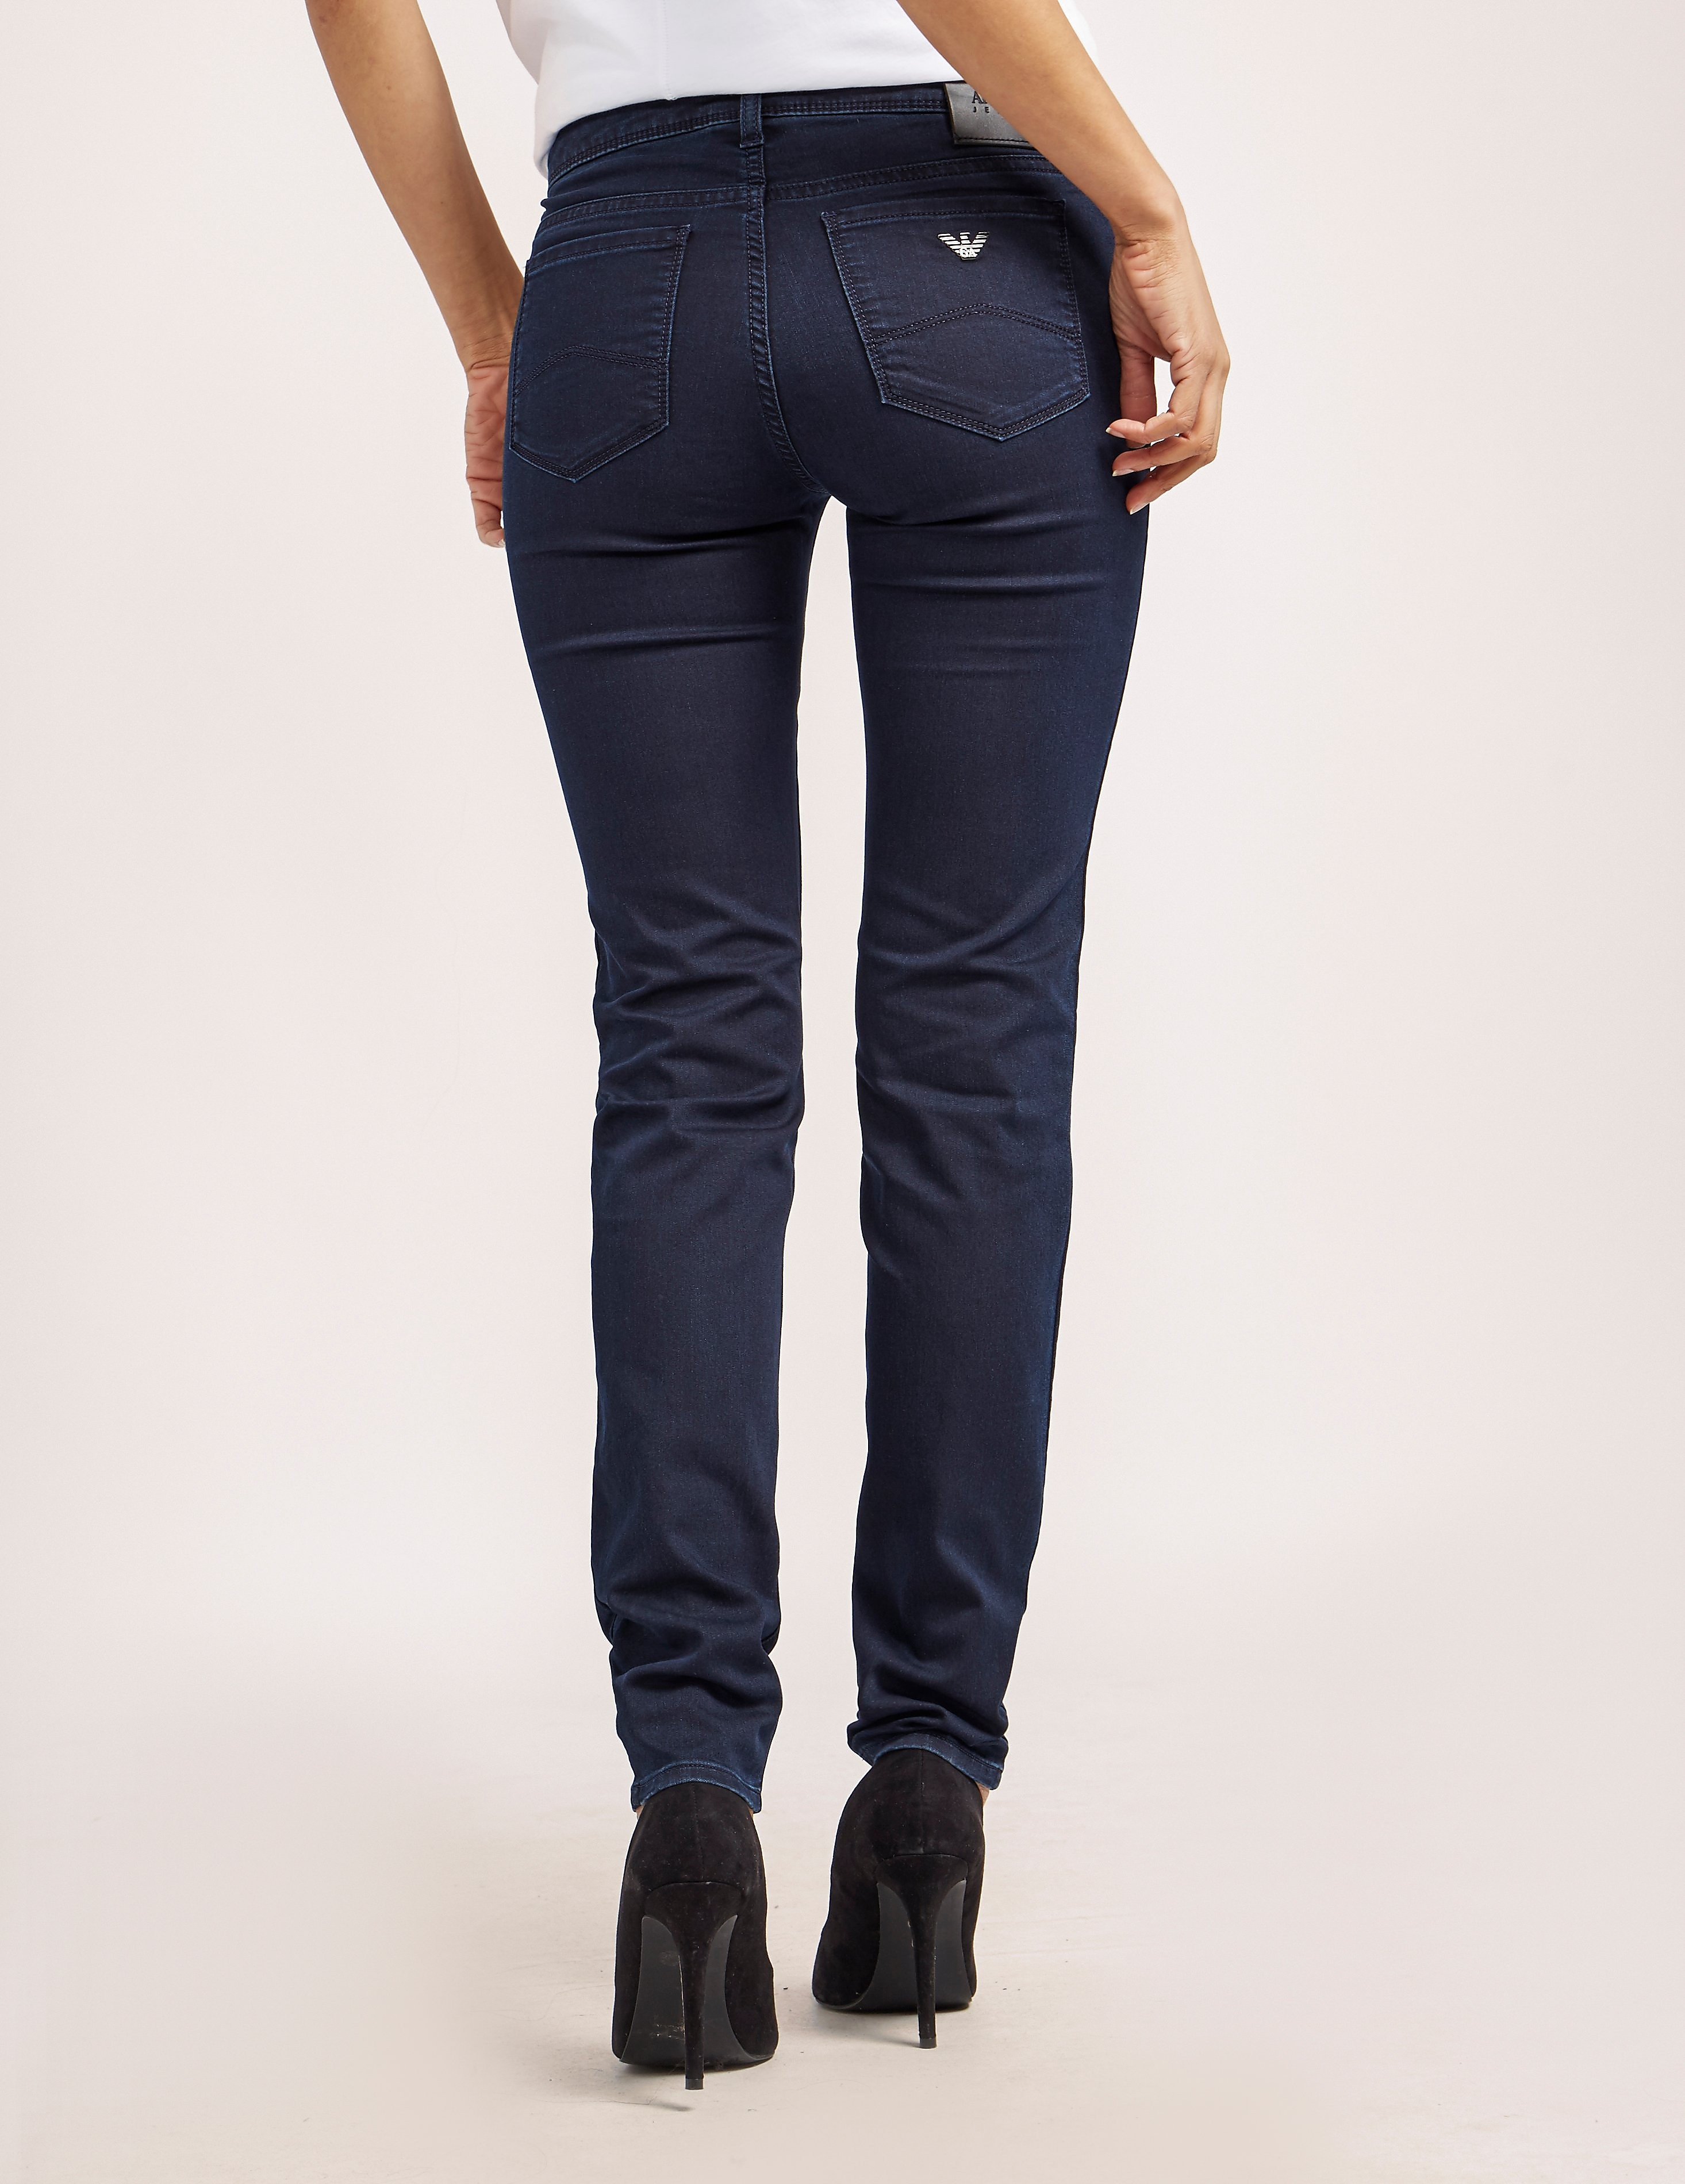 Armani Jeans J28 Mid Waist Jeans